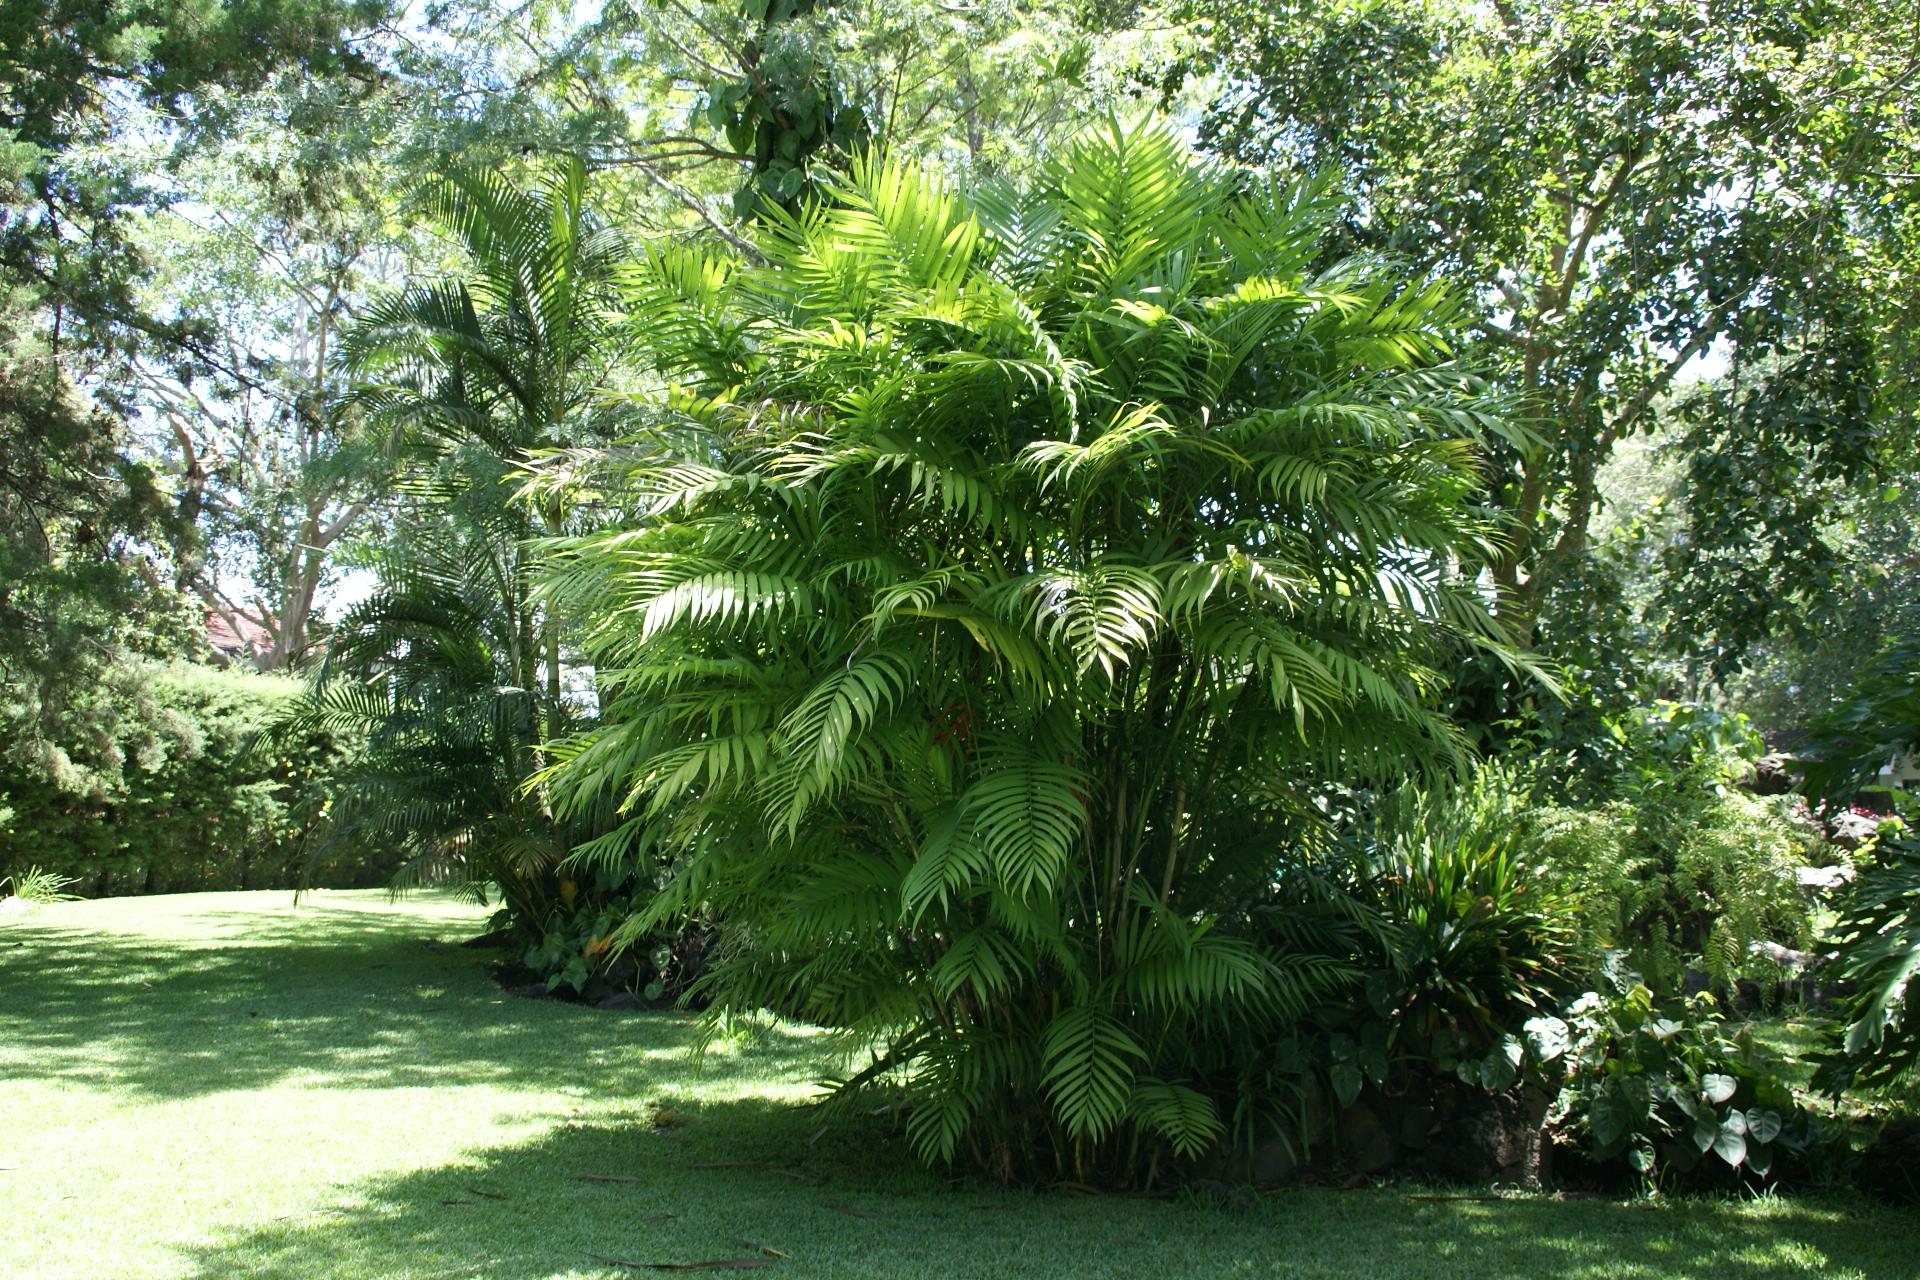 Chamaedorea tepejilote wikiwand for Au jardin des malentendus